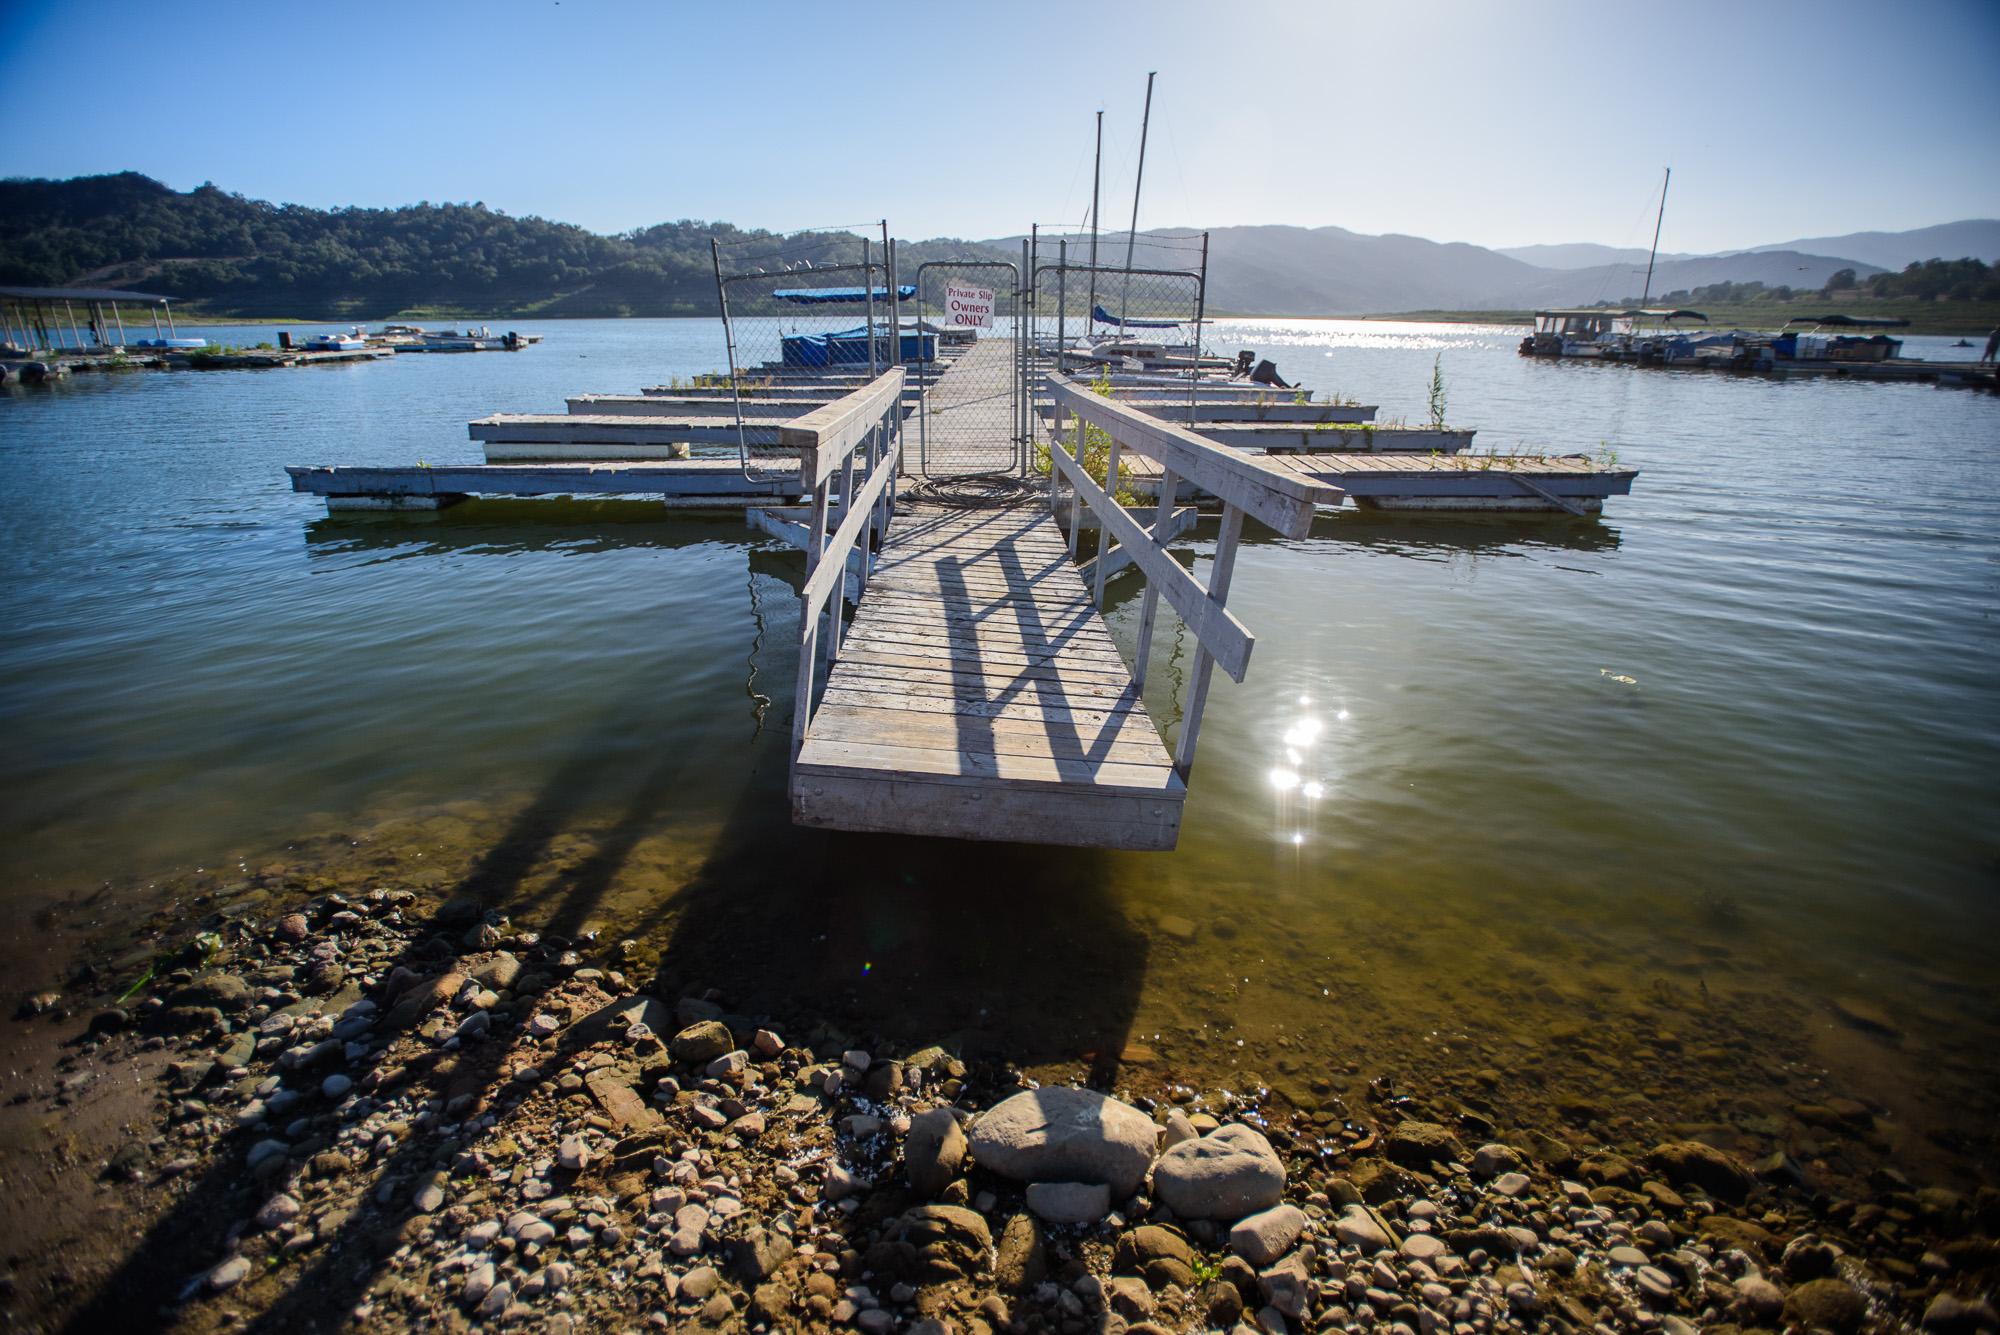 lake_casitas_dock_dry_brittany_app.jpg